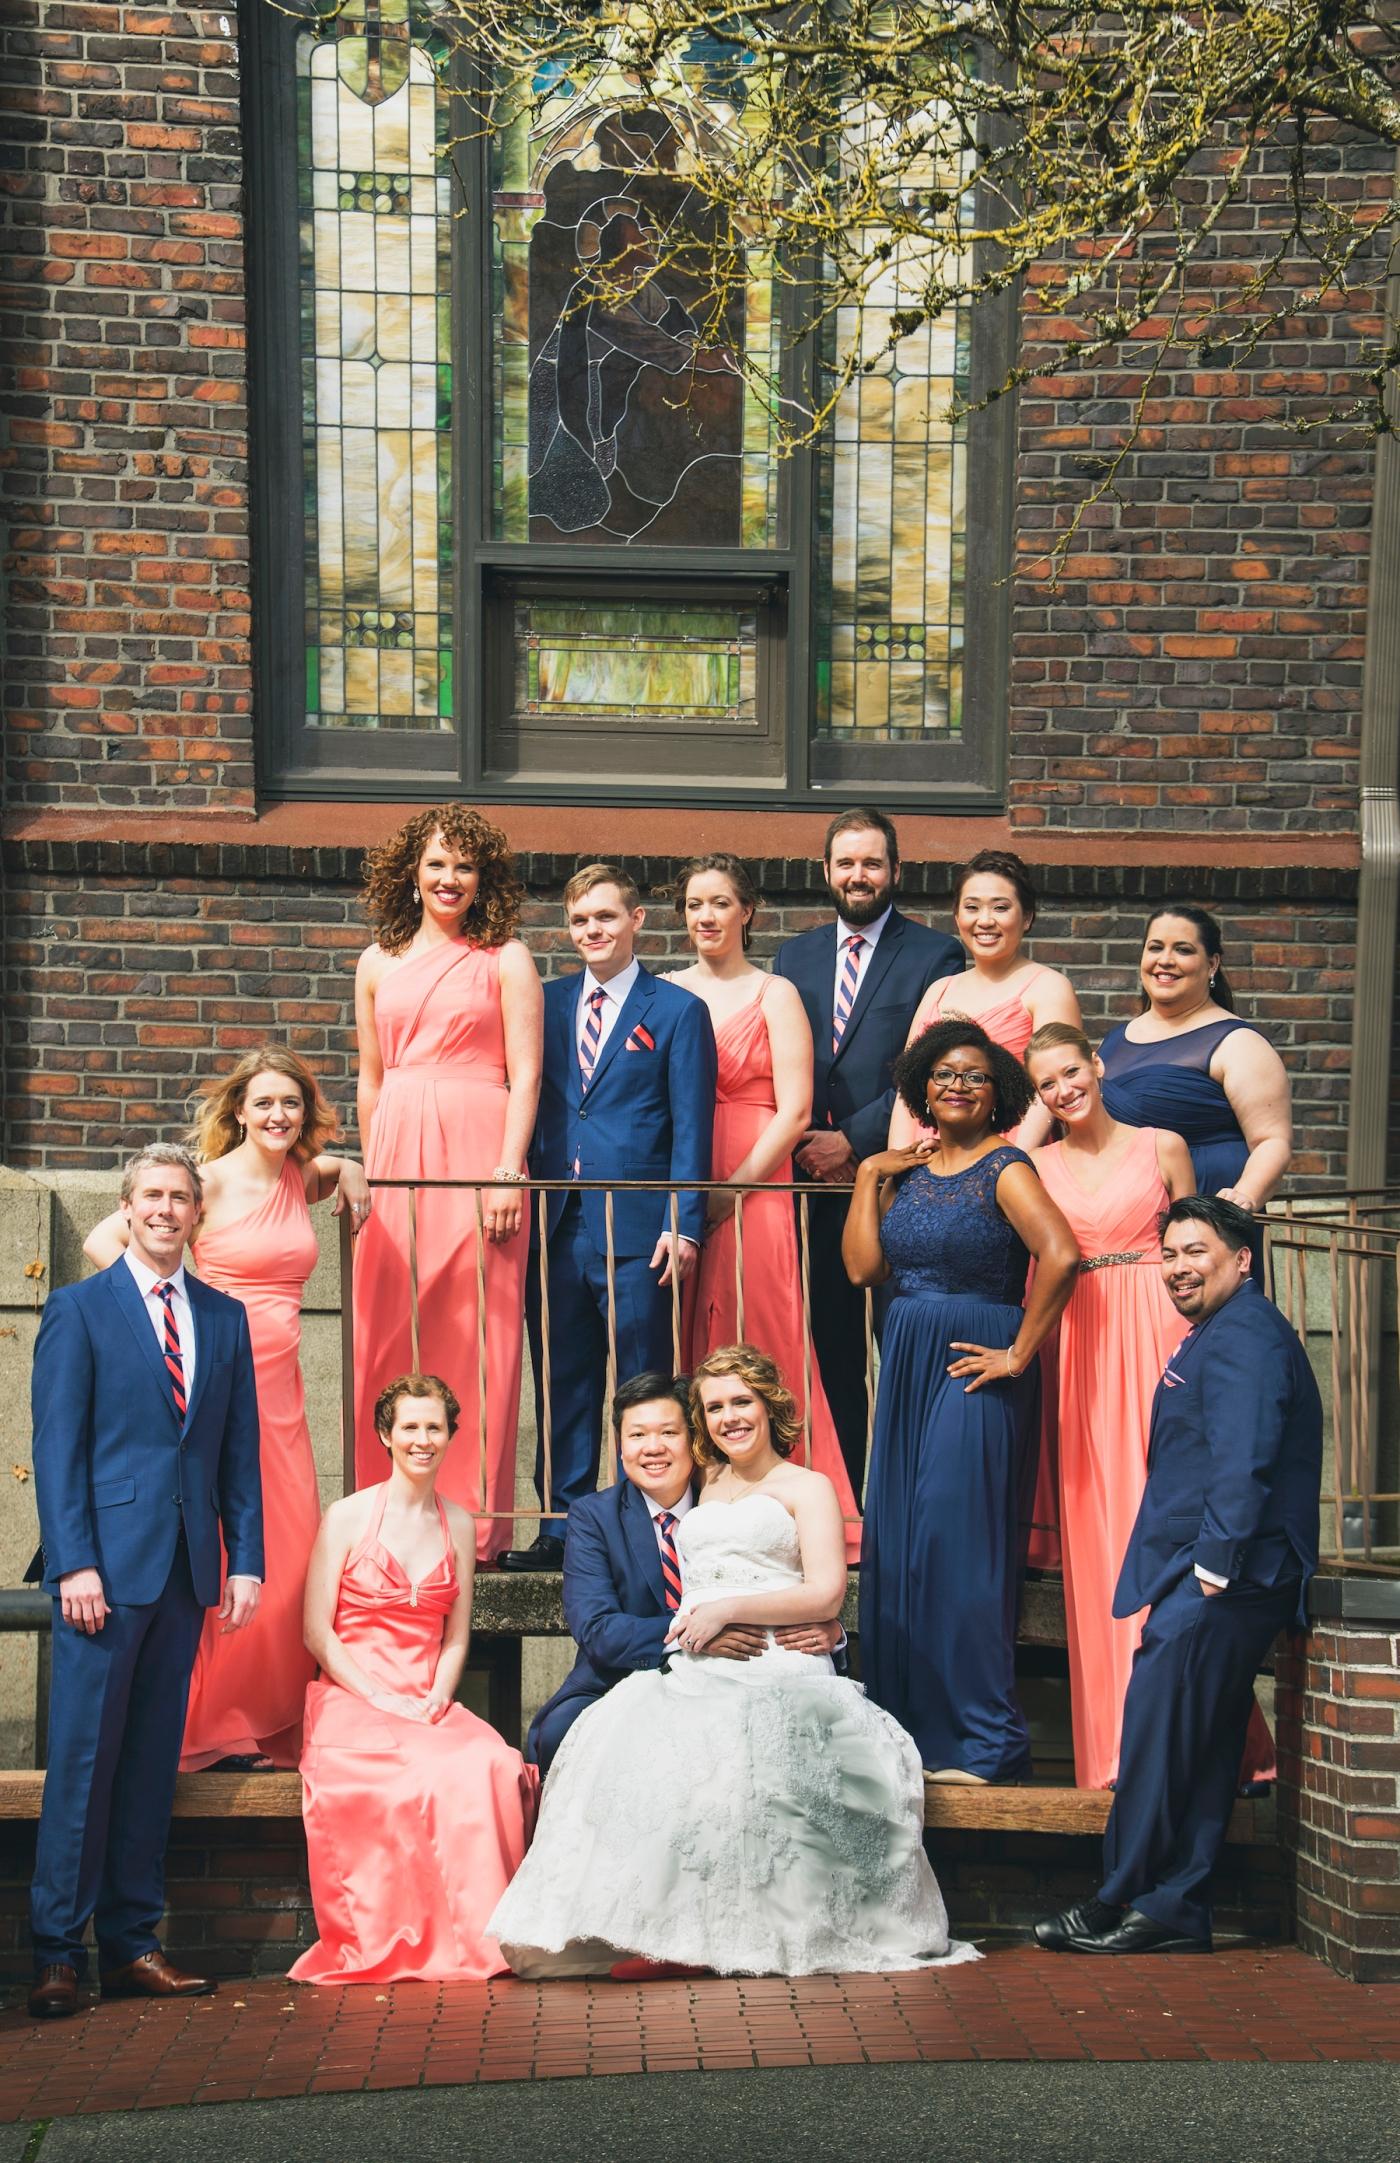 DSC_2190Everett_Wedding_Ballroom_Jane_Speleers_photography_Rachel_and_Edmund_Bridesmaids_peach_dresses_groomsmen_2017